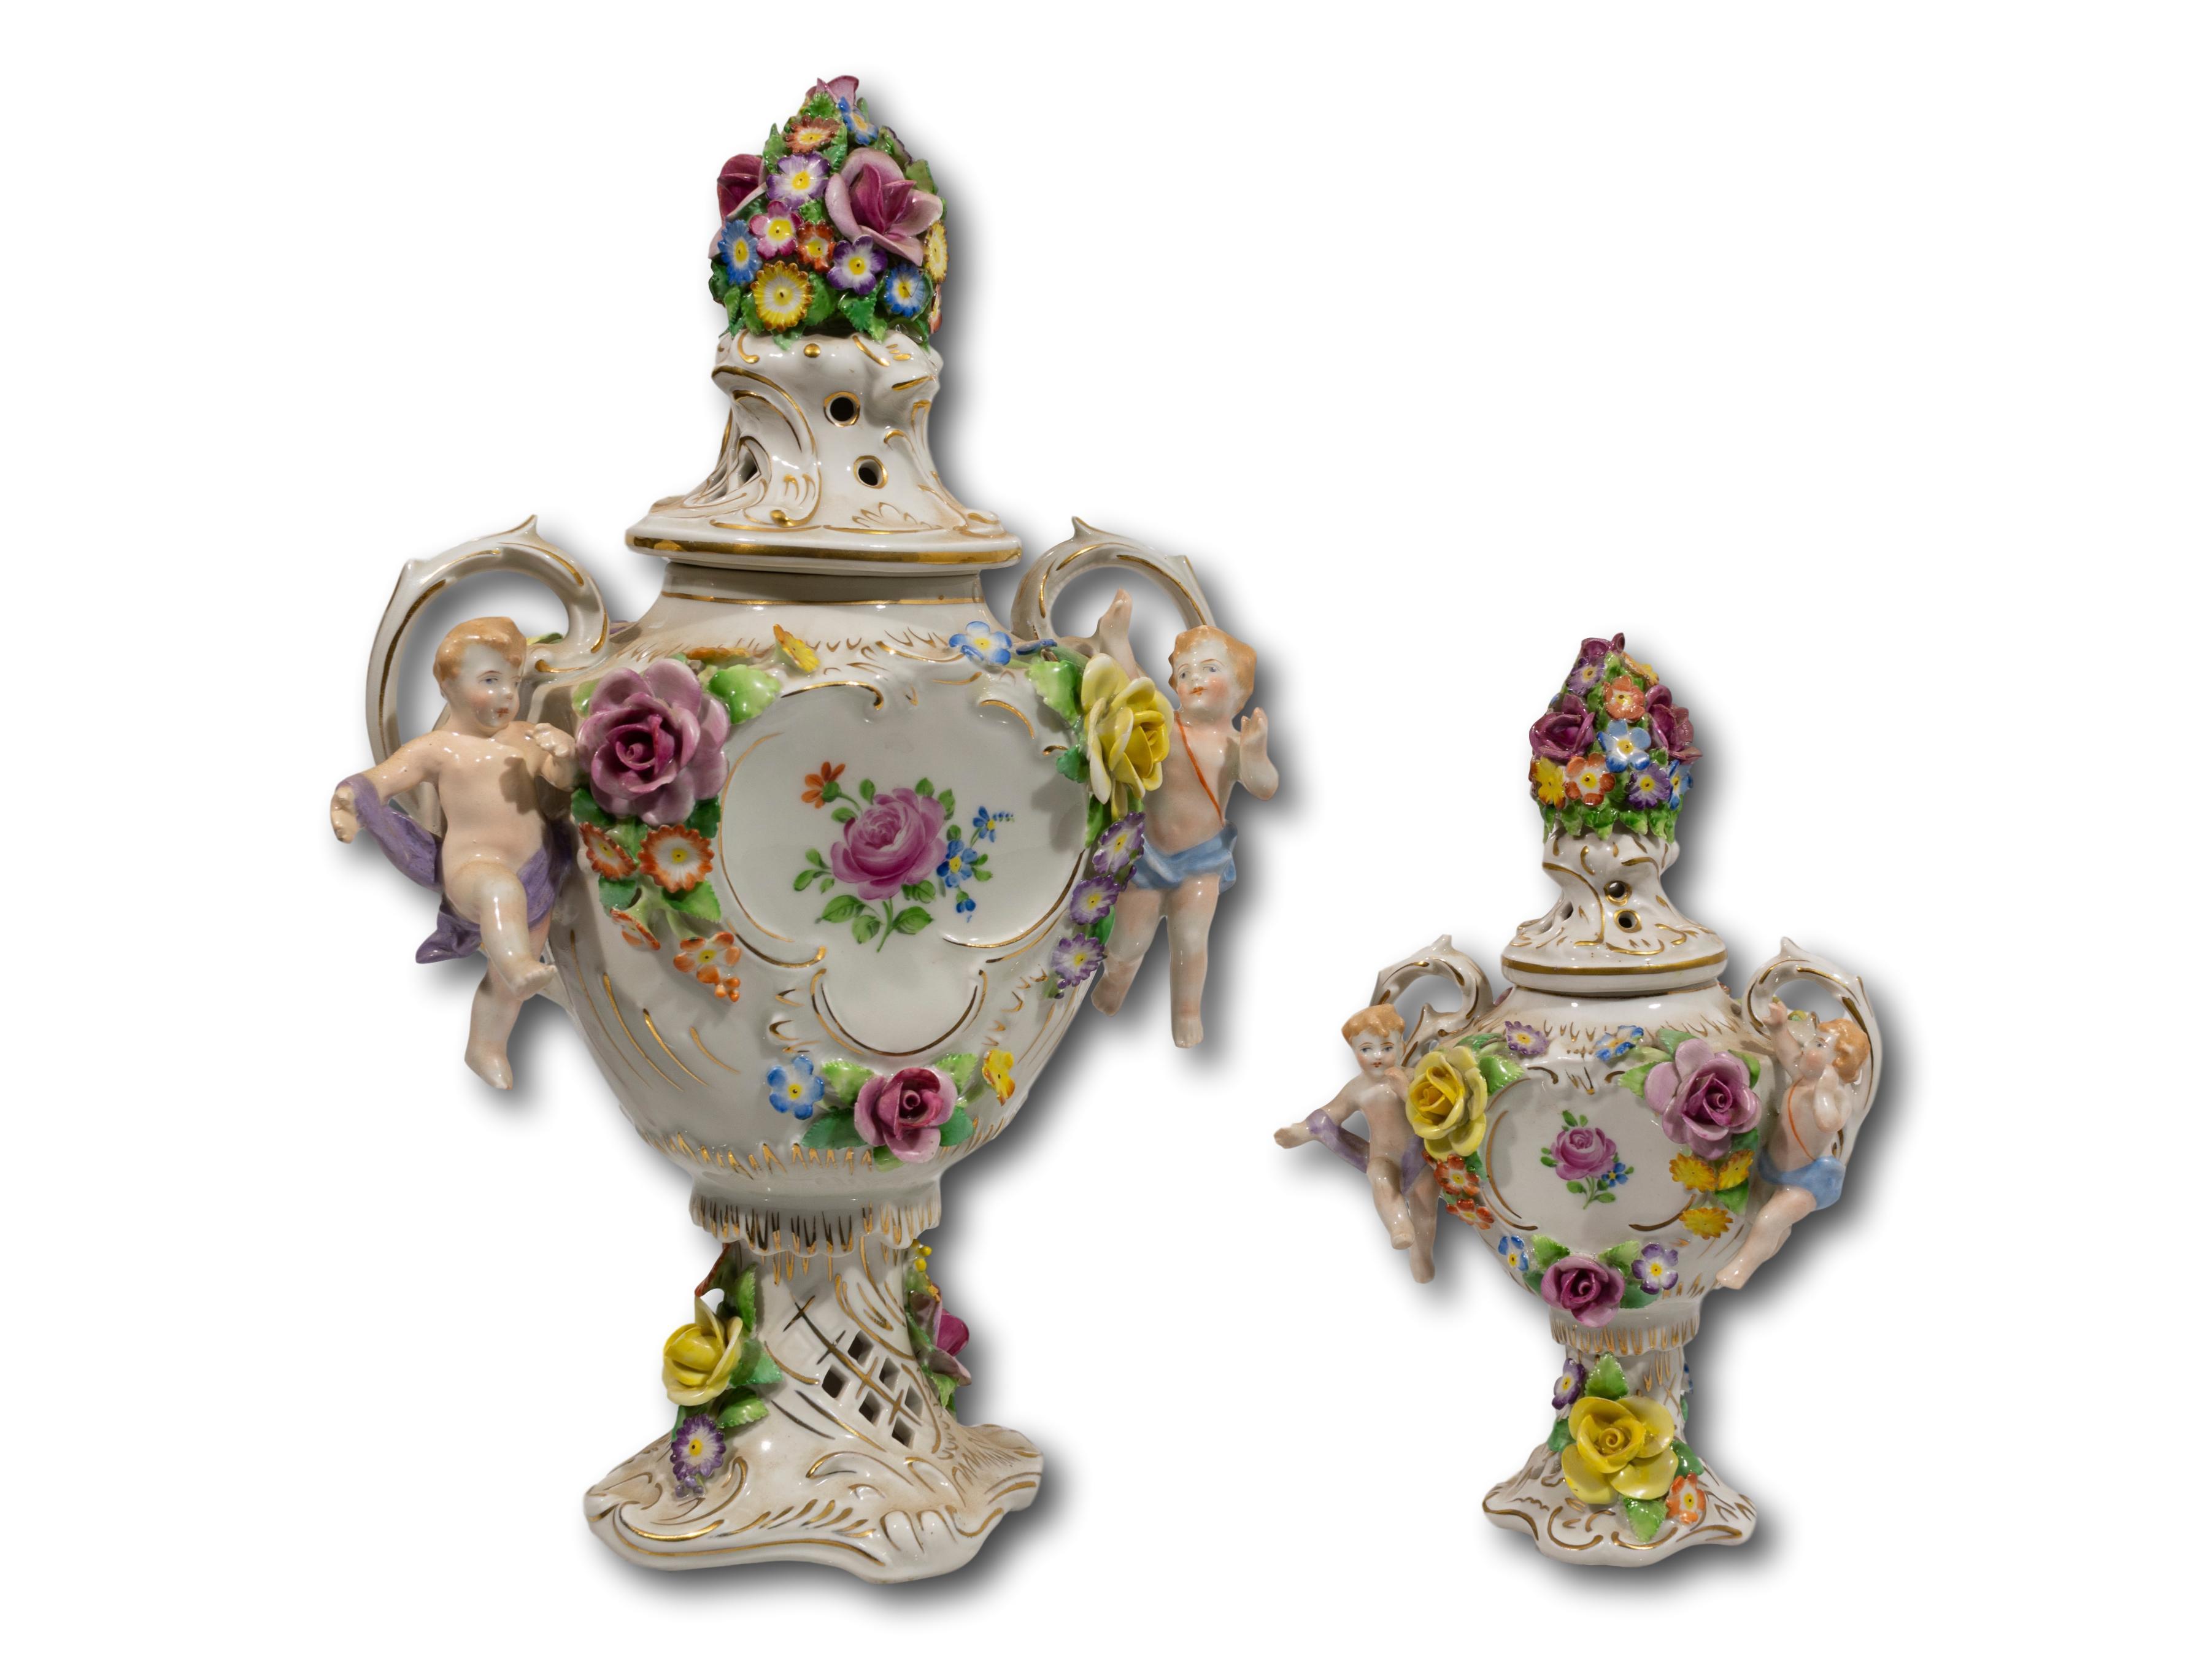 A Pair of Sitzendorf Porcelain Cherub Covered Urns, 32cm & 20cm